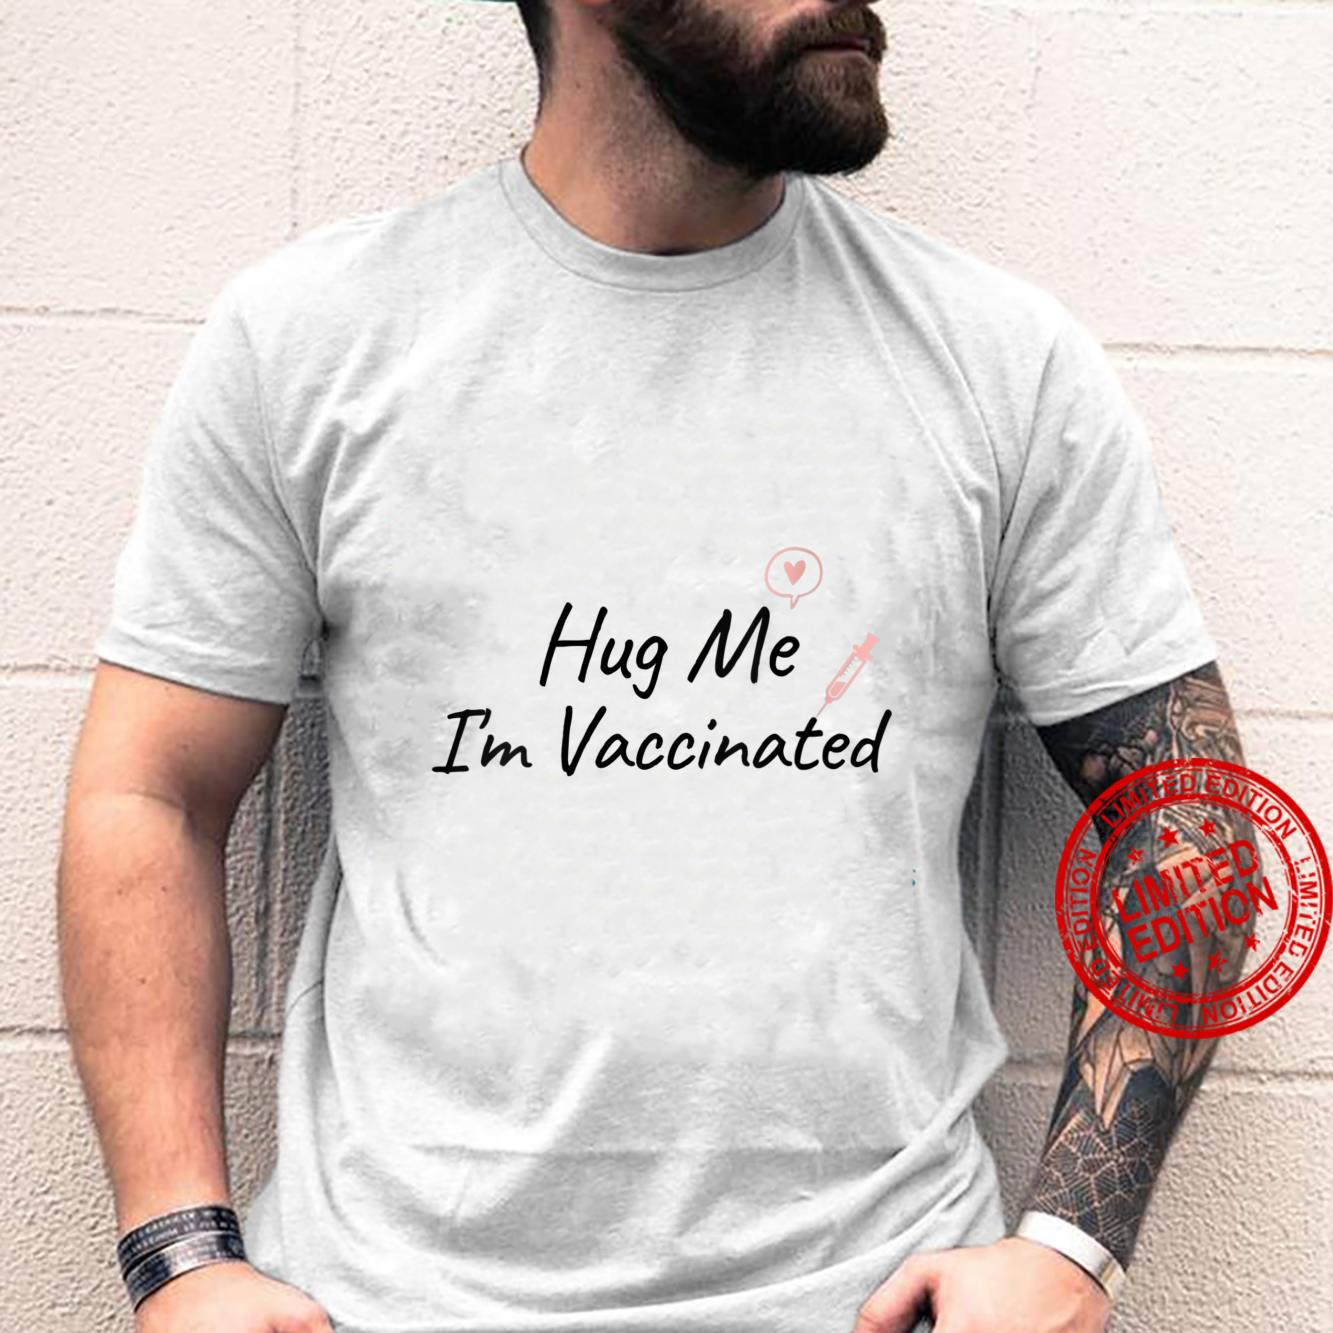 Womens Hug Me I'm Vaccinated, Pro Vaccine, Life Is Good, Shirt